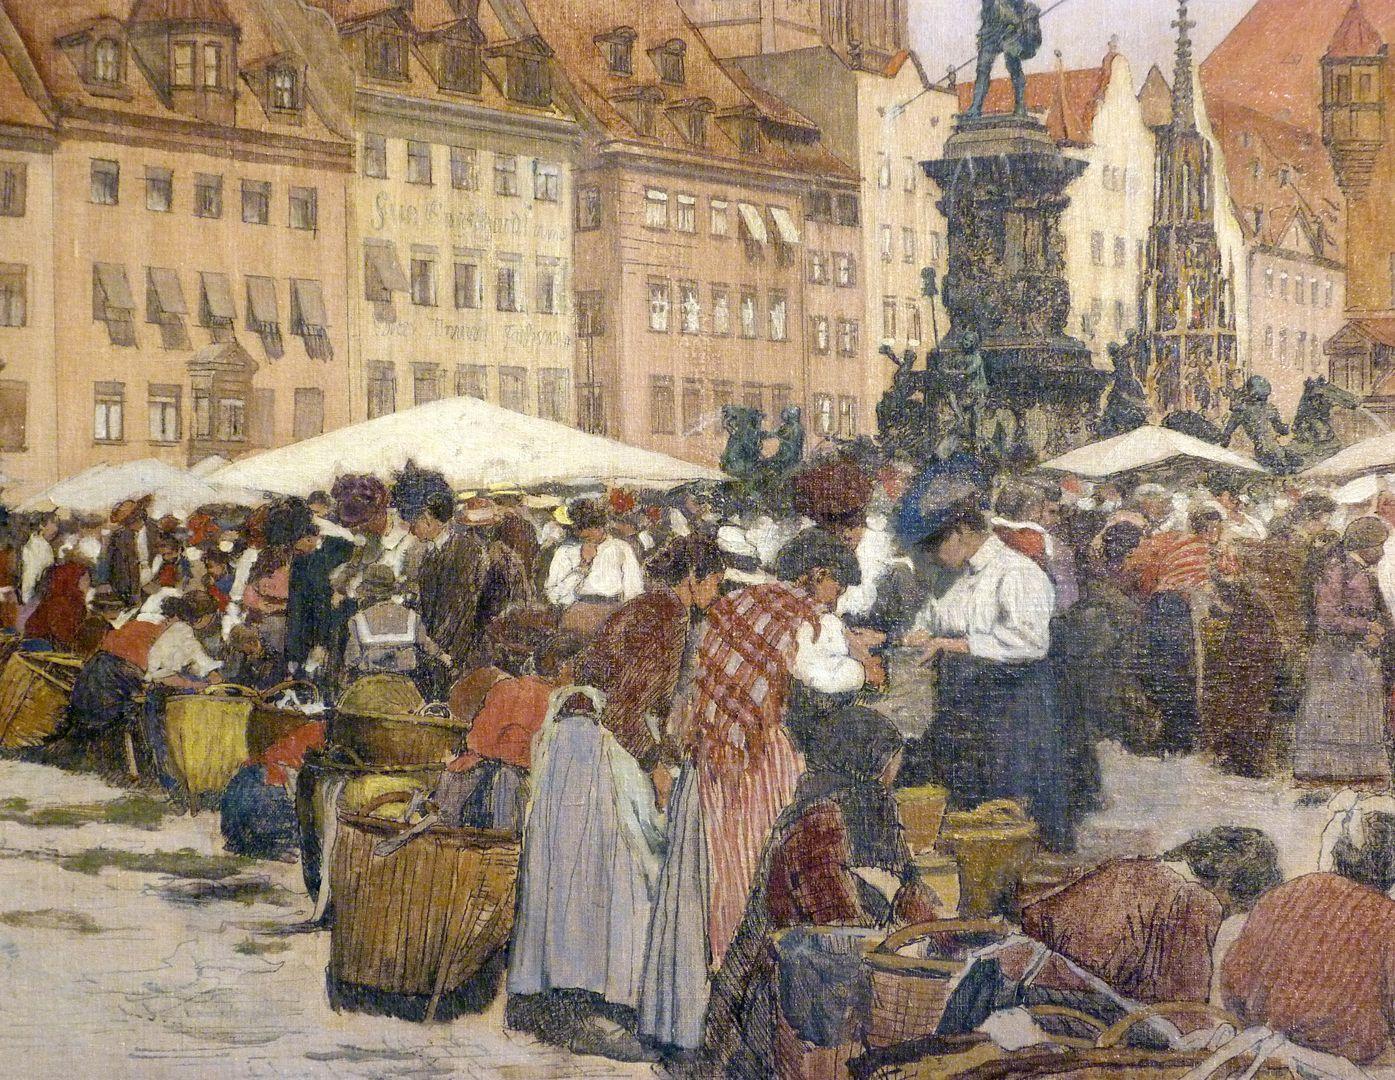 Main market in Nuremberg Left lower segment